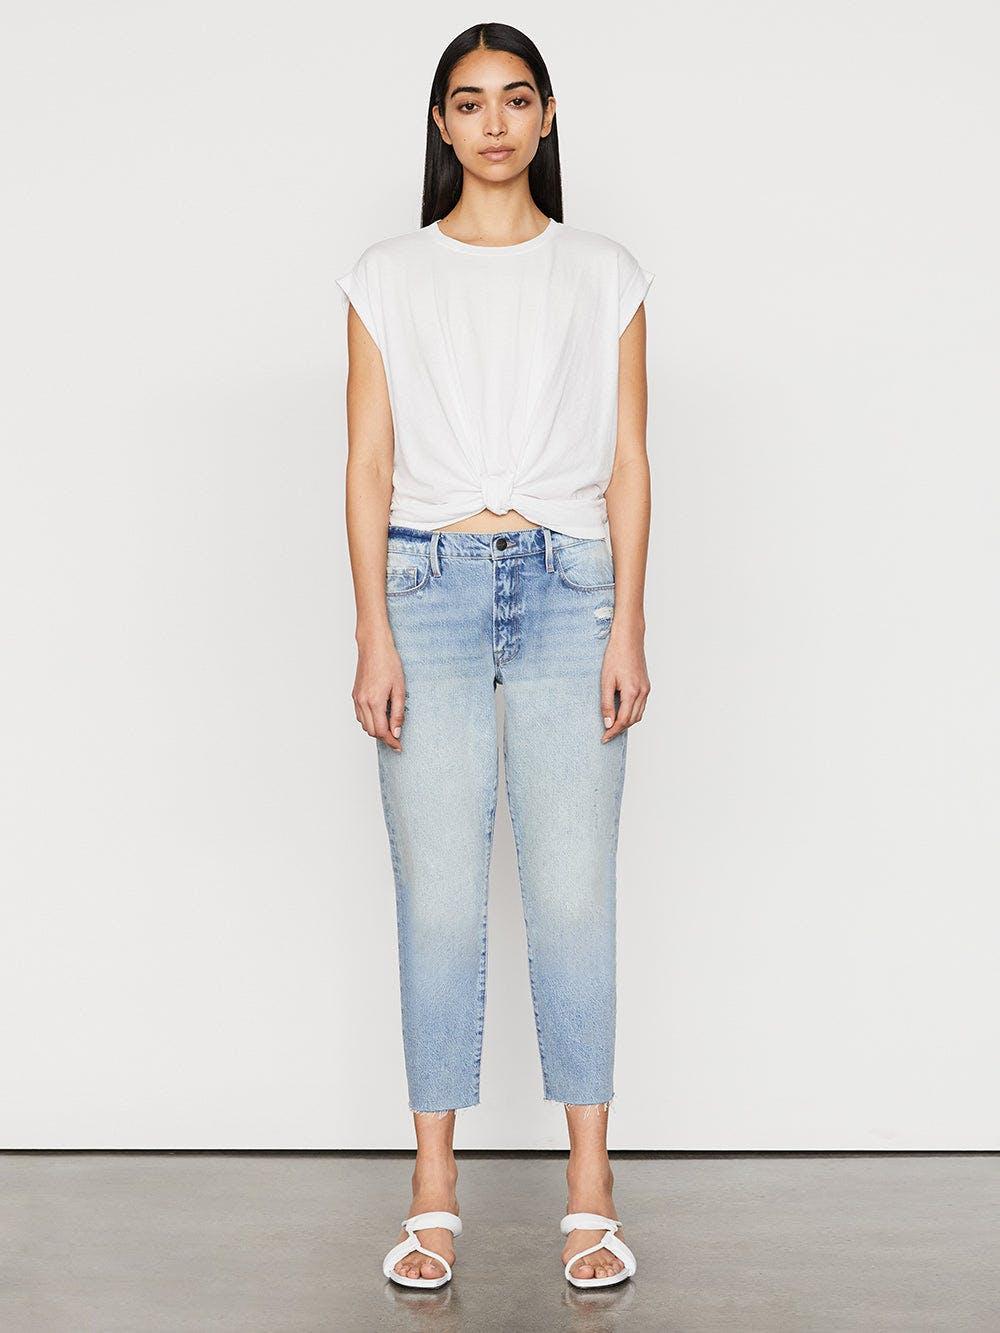 jeans full body view alt:hover